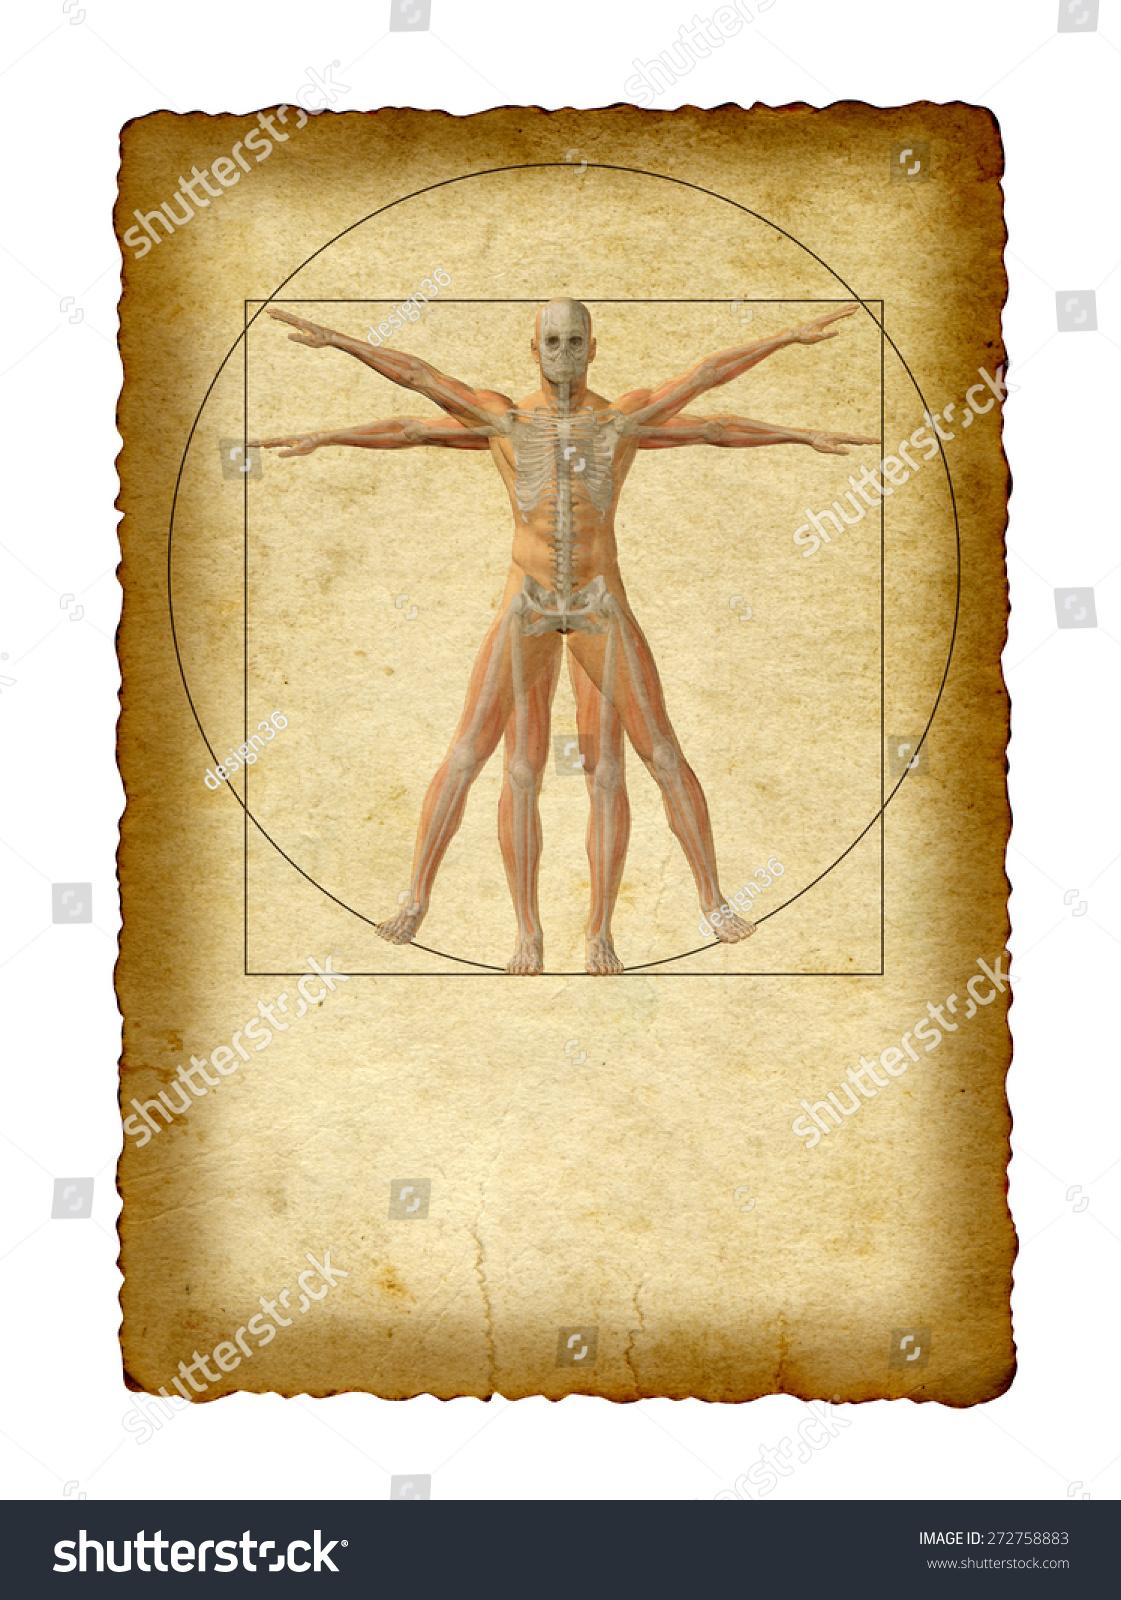 Concept Conceptual Vitruvian Human Body Drawing Stock Illustration